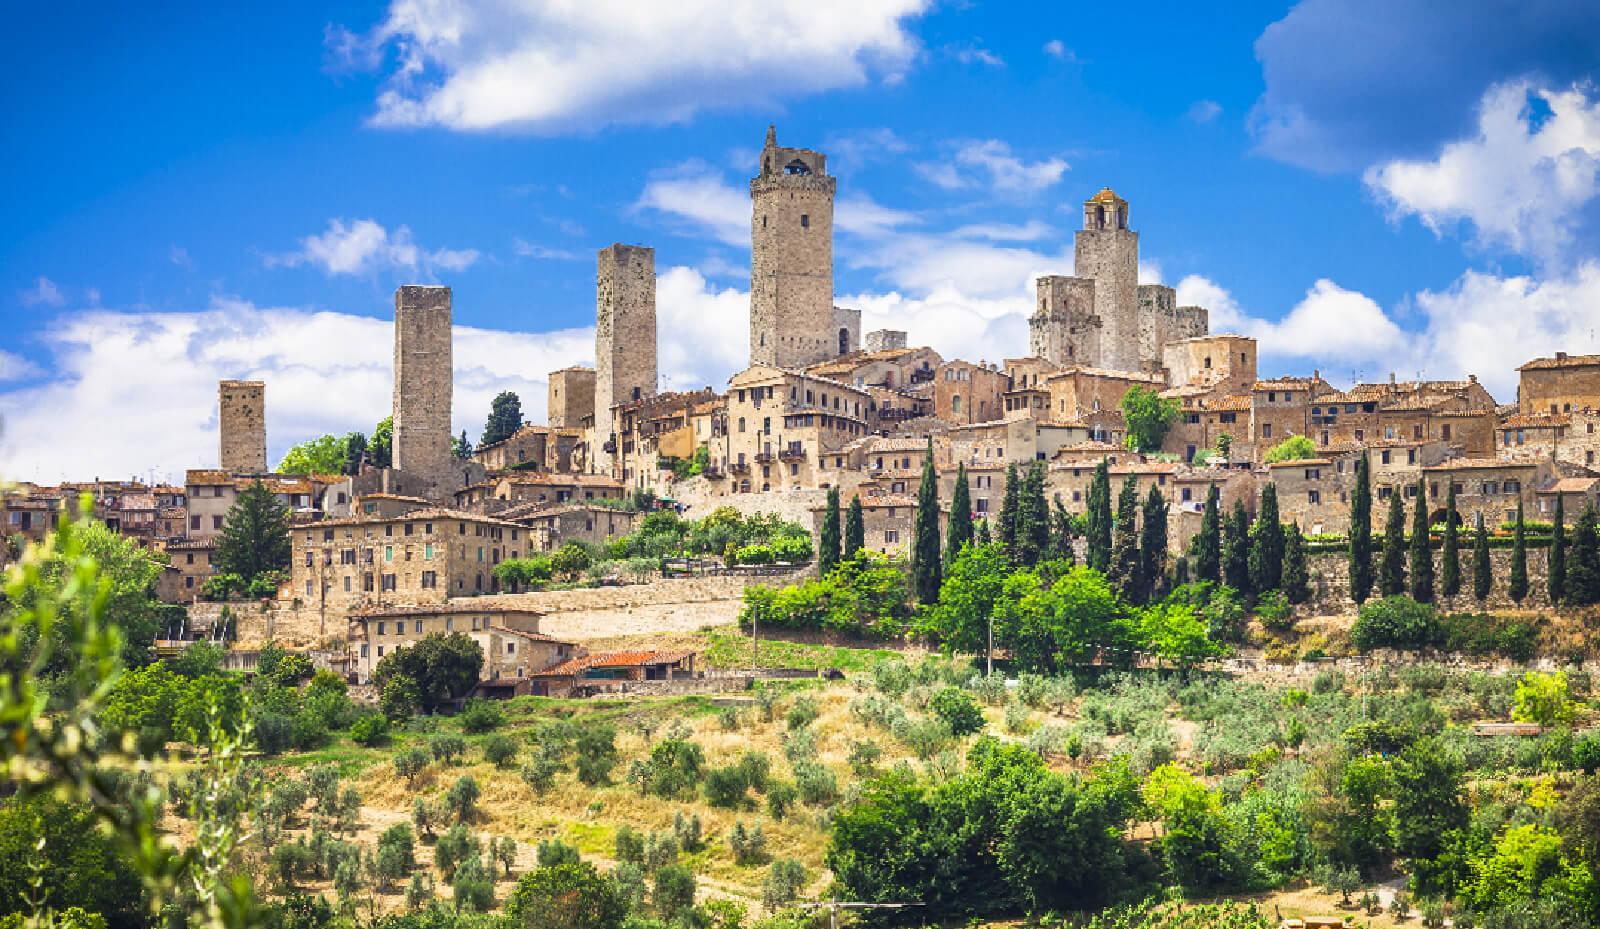 Siena & San Gimignano Day Trip From Rome